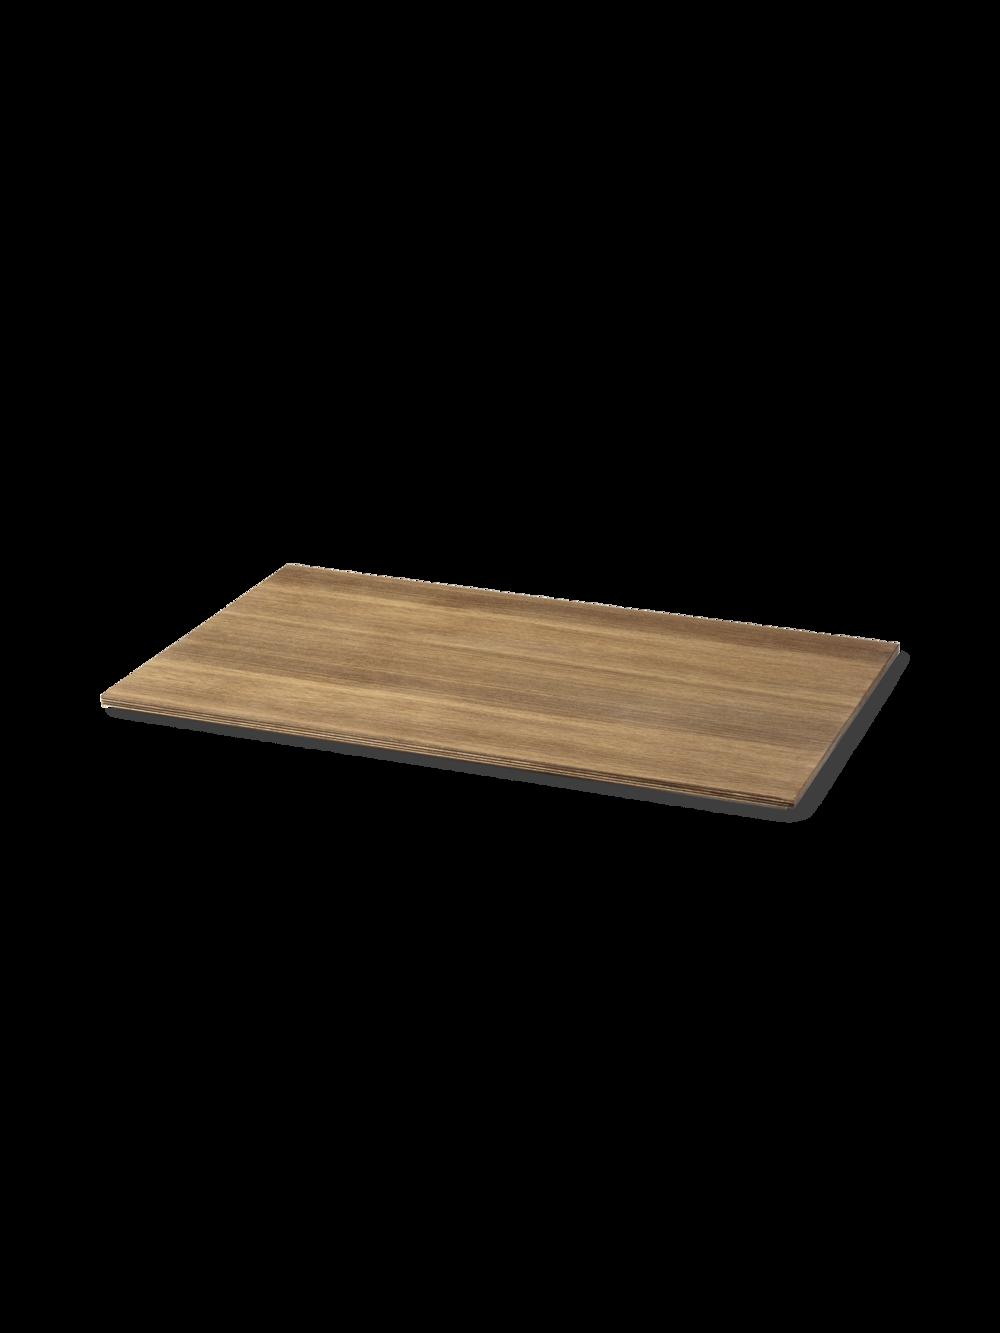 Tray for Plant Box Large - Wood Smoked Oak